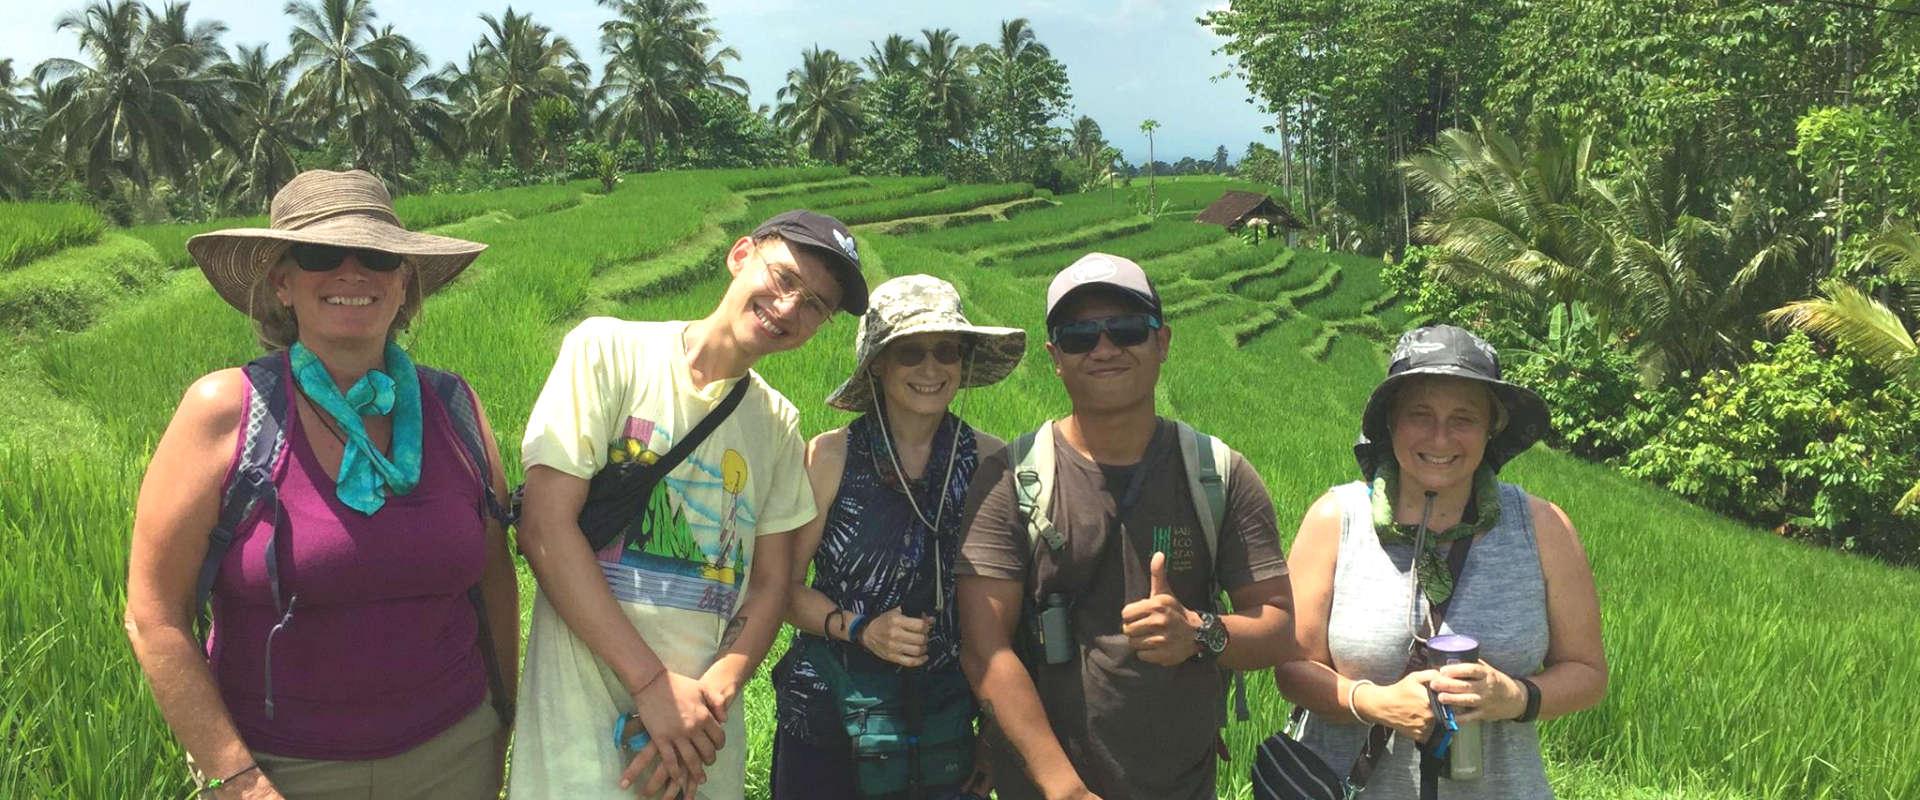 Trekking near Bali Eco Stay